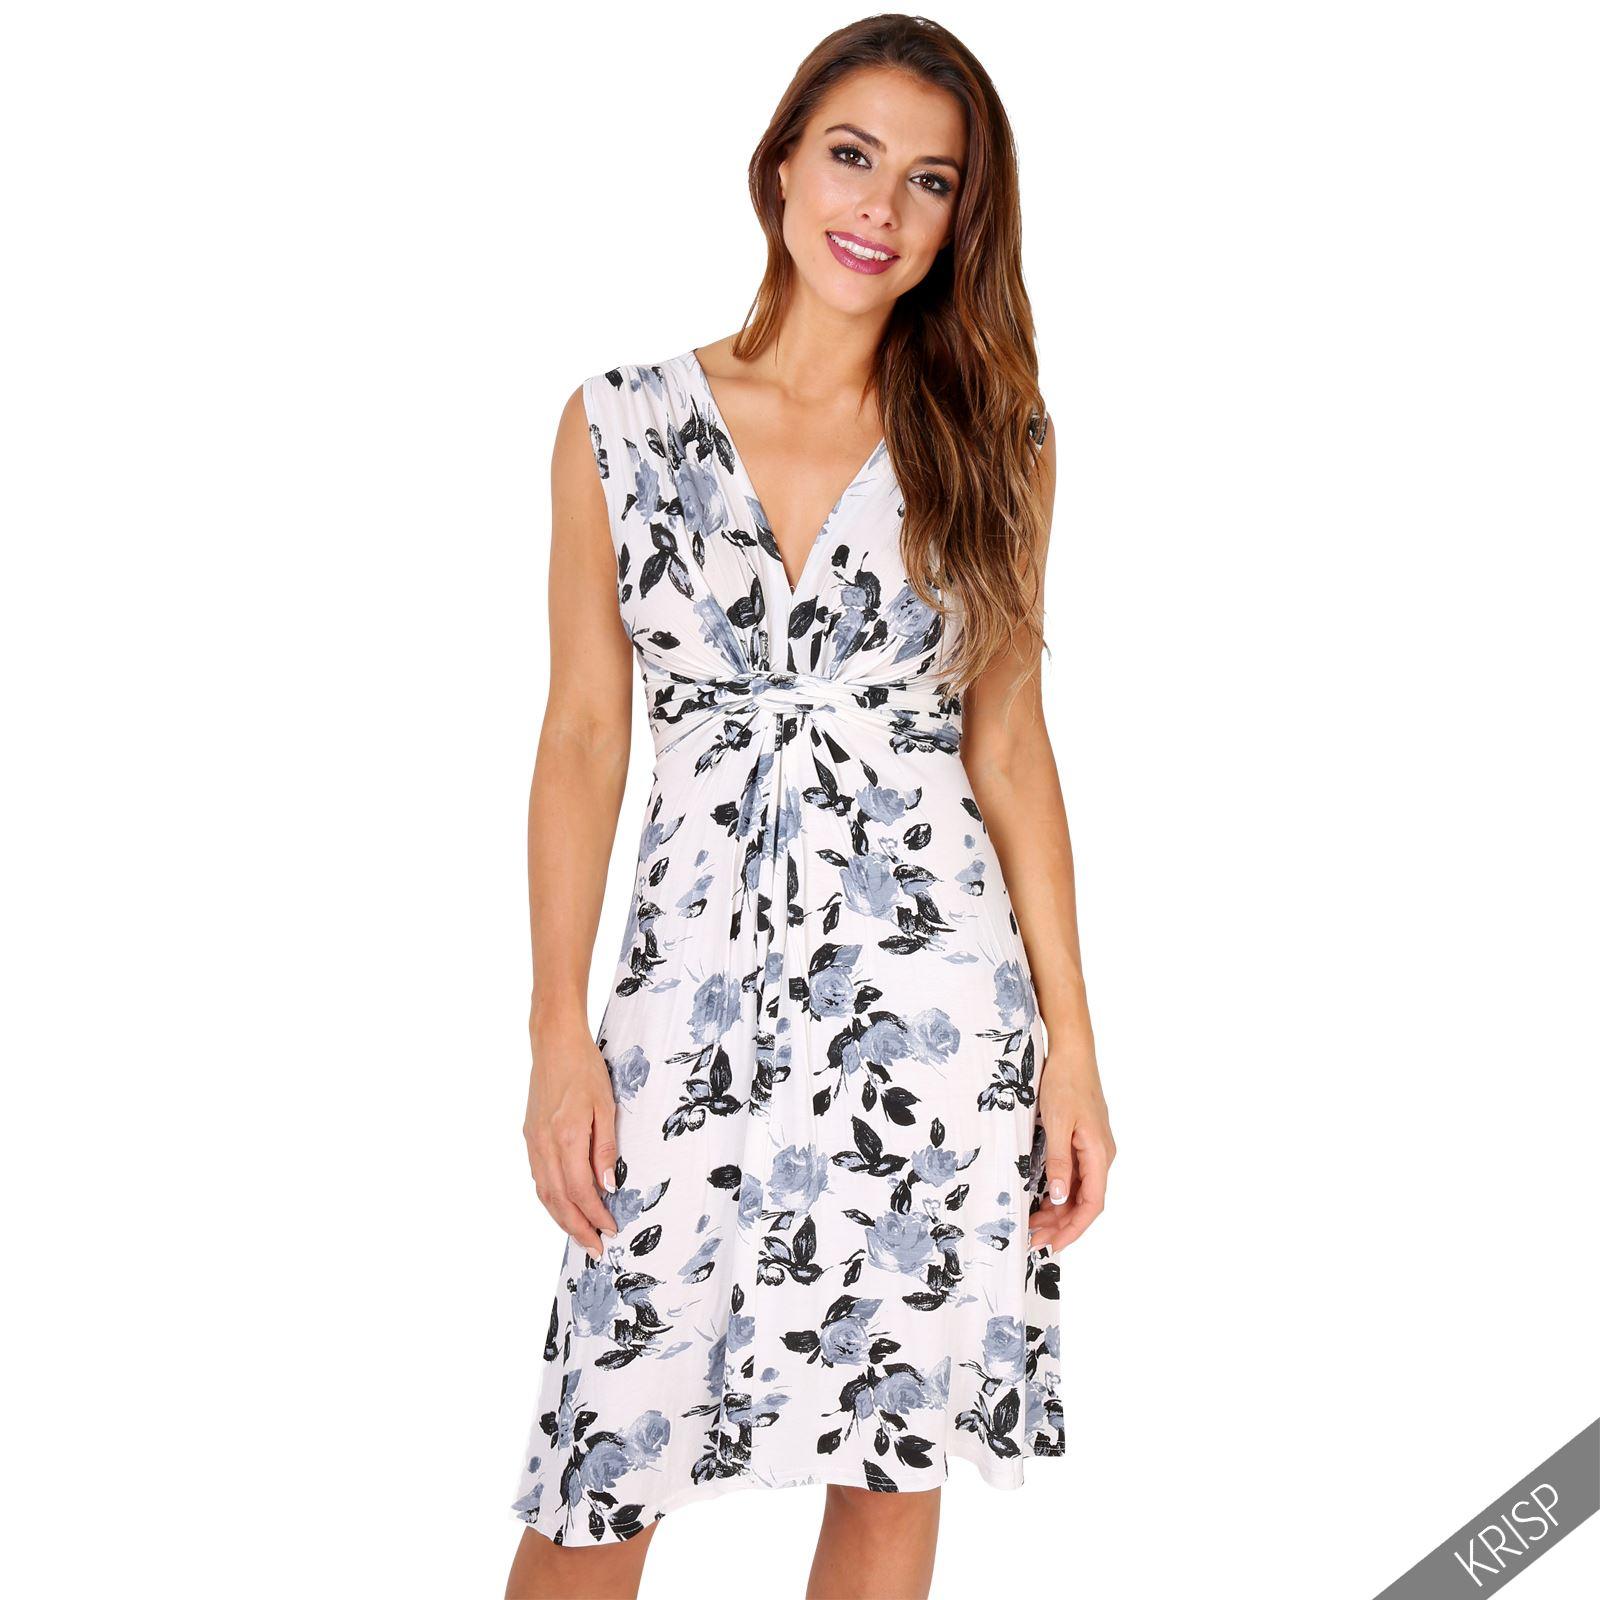 Damen blumen v ausschnitt knoten kleid gebl mtes knielanges sommerkleid ebay - Sommerkleid v ausschnitt ...